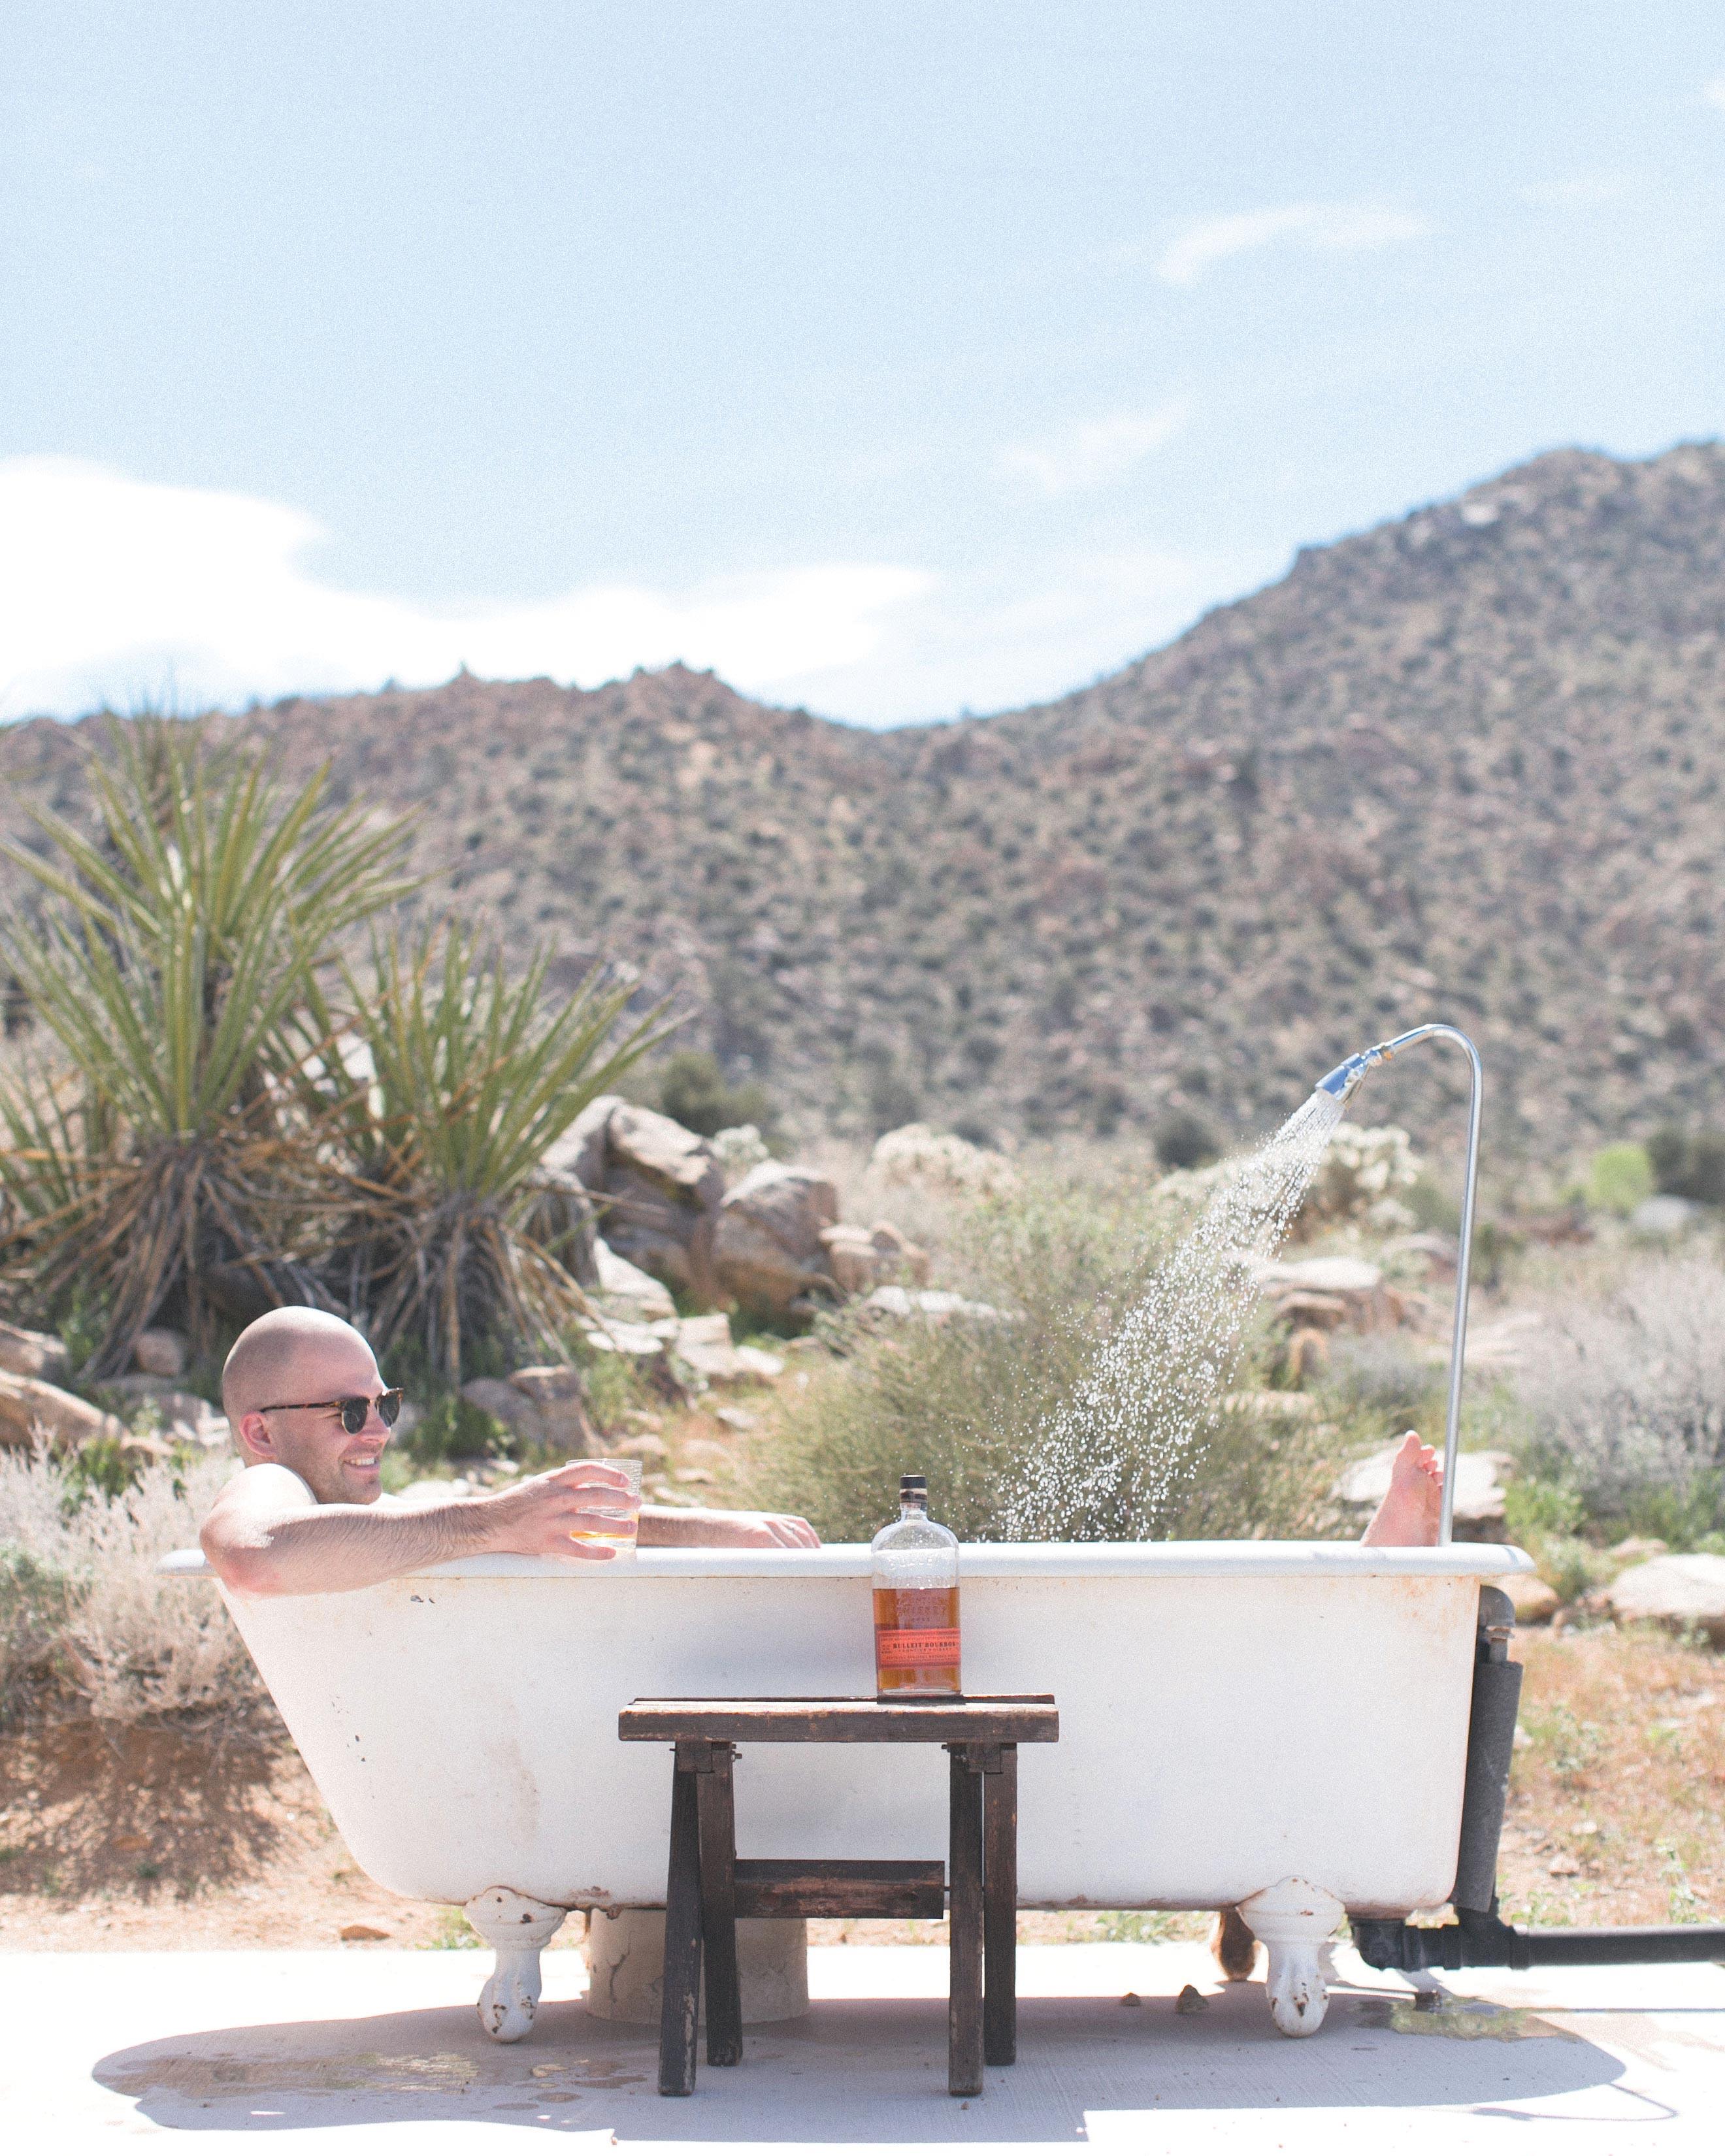 travel-honeymoon-diaries-air-bnb-joshua-tree-bath-tub-outdoor-s112941.jpg